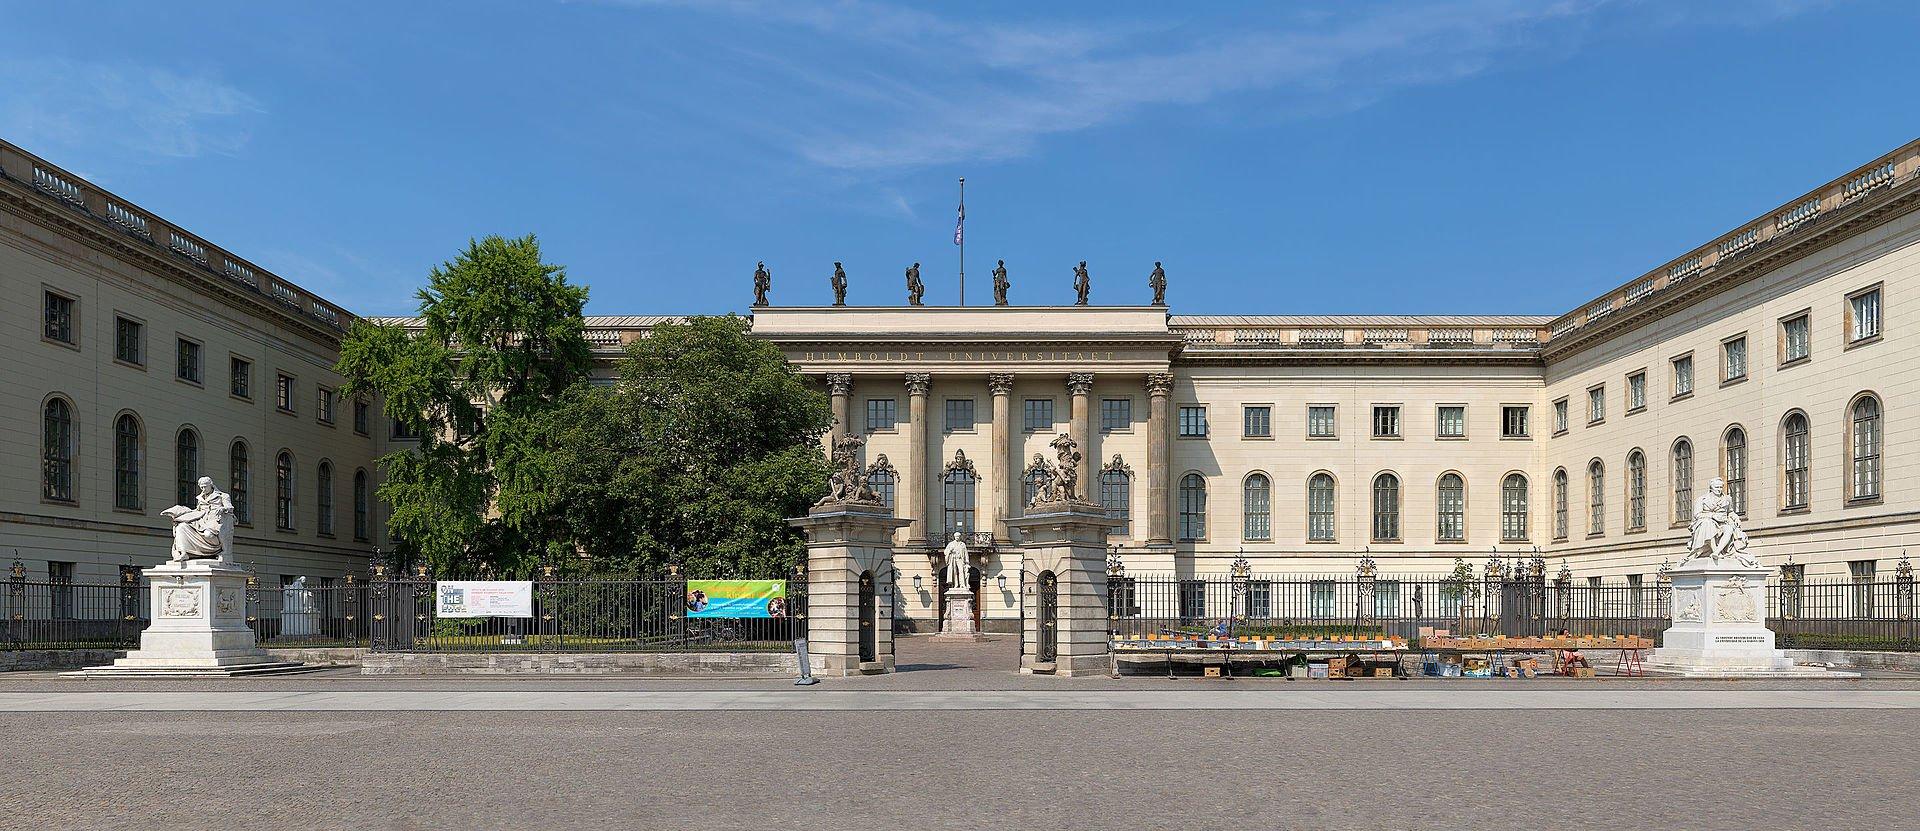 front of the humboldt university in berlin